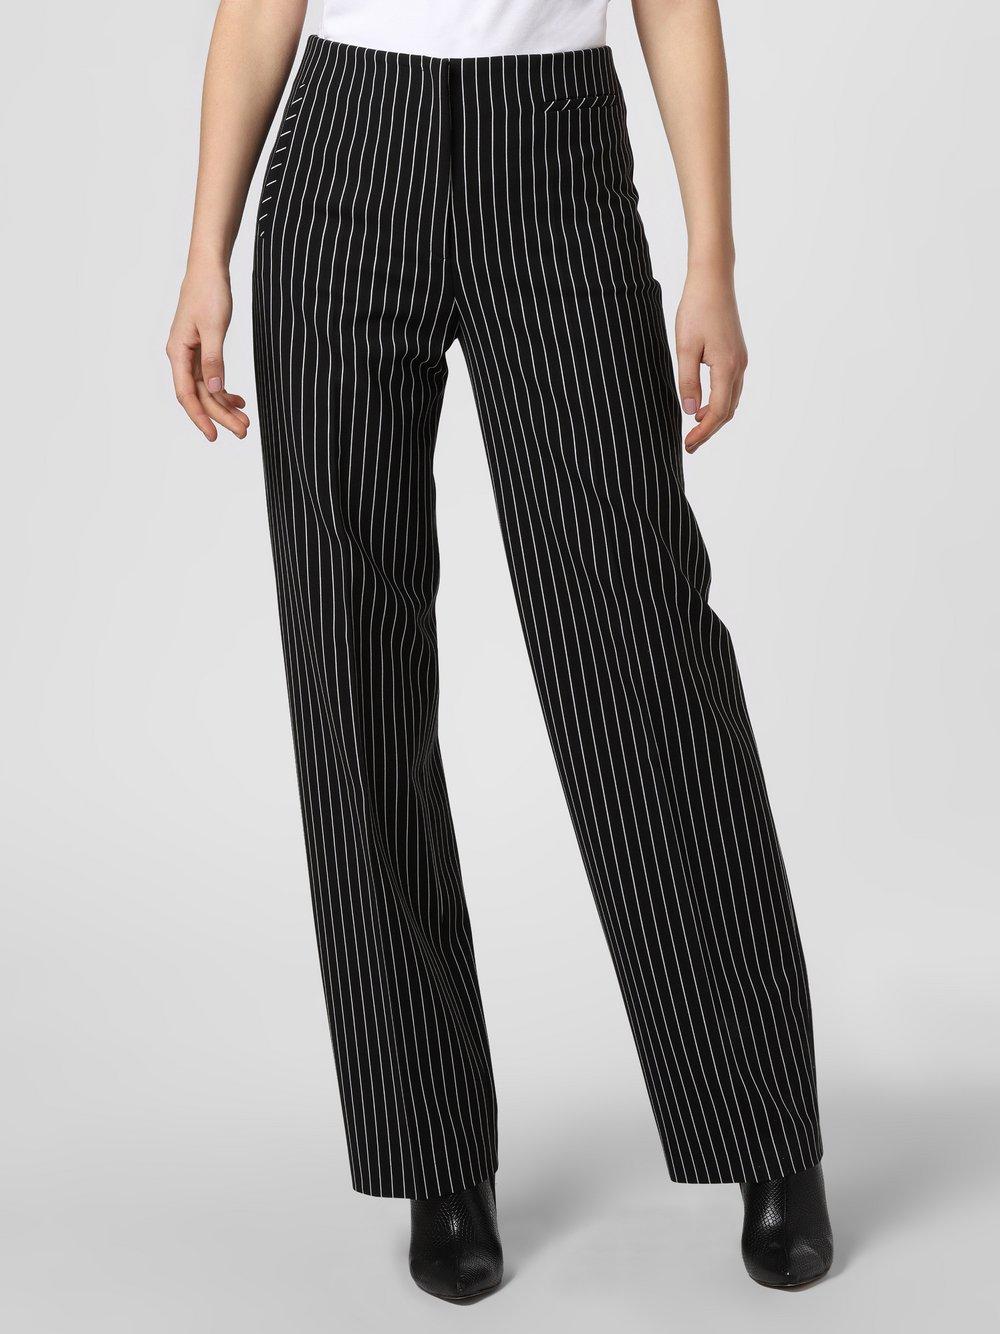 HUGO - Spodnie damskie – Hedire, czarny